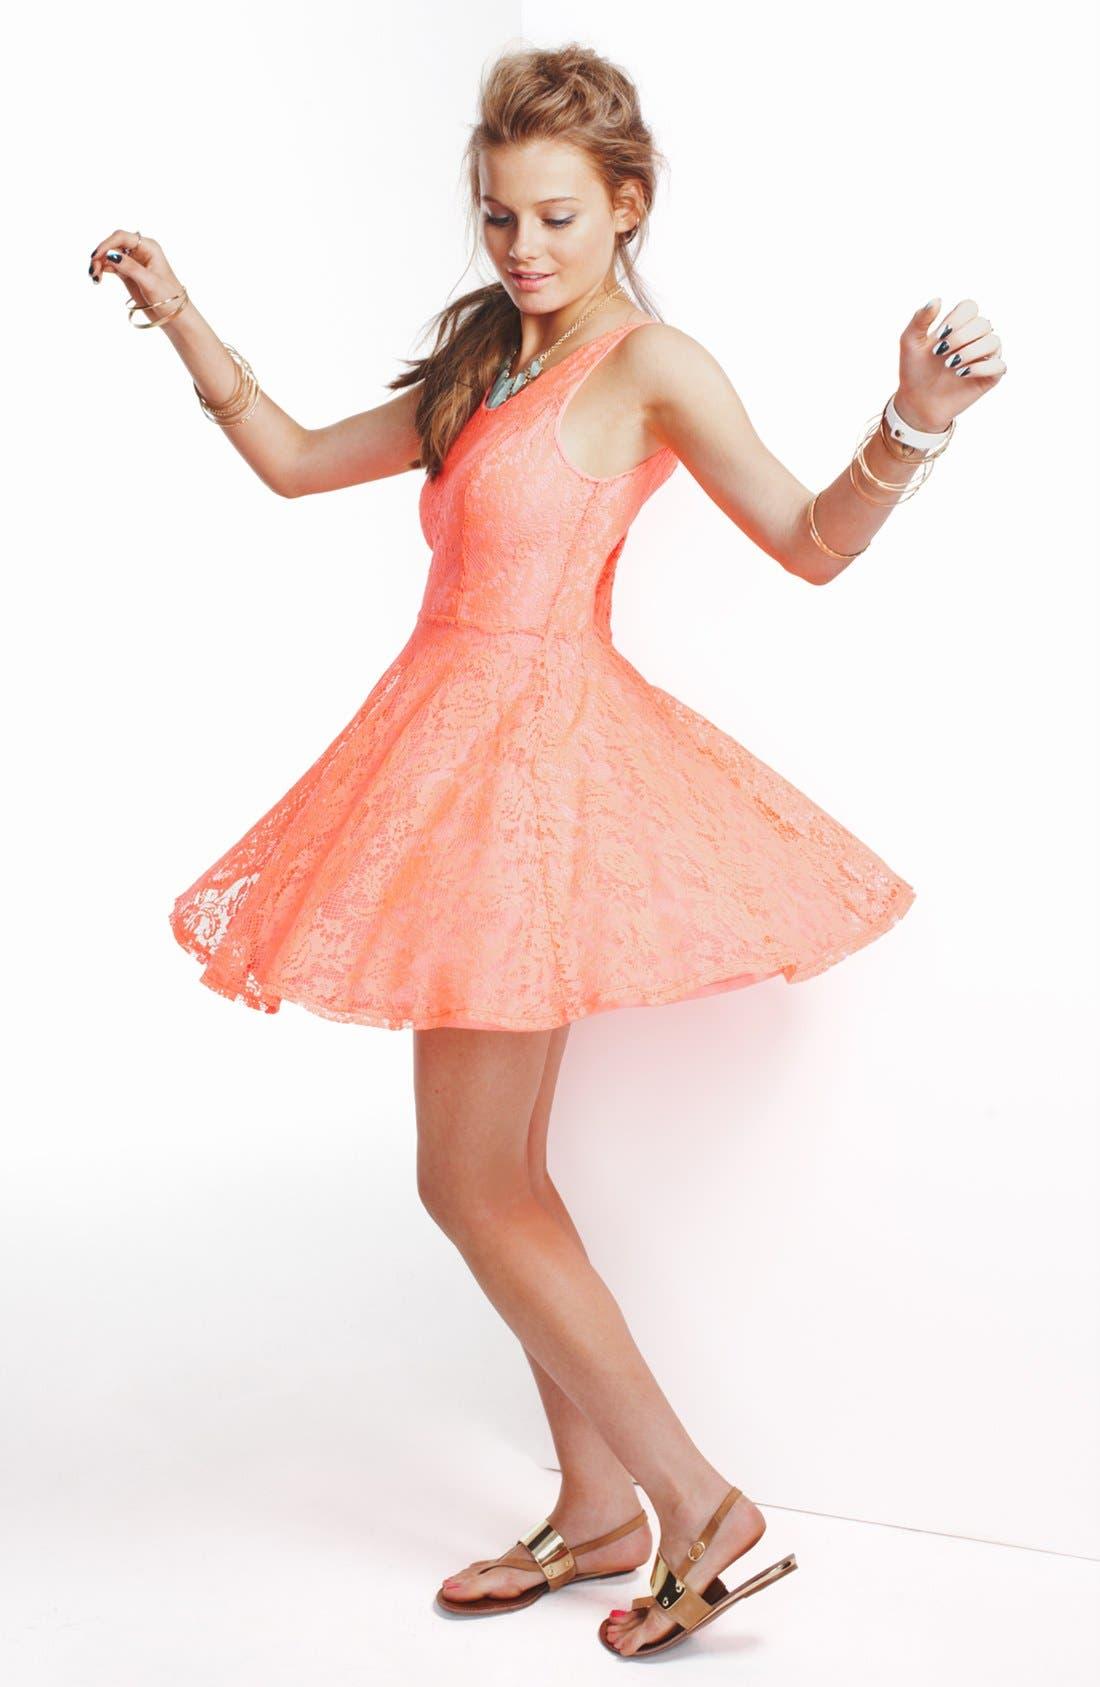 Alternate Image 1 Selected - Robin K Skater Dress & Accessories